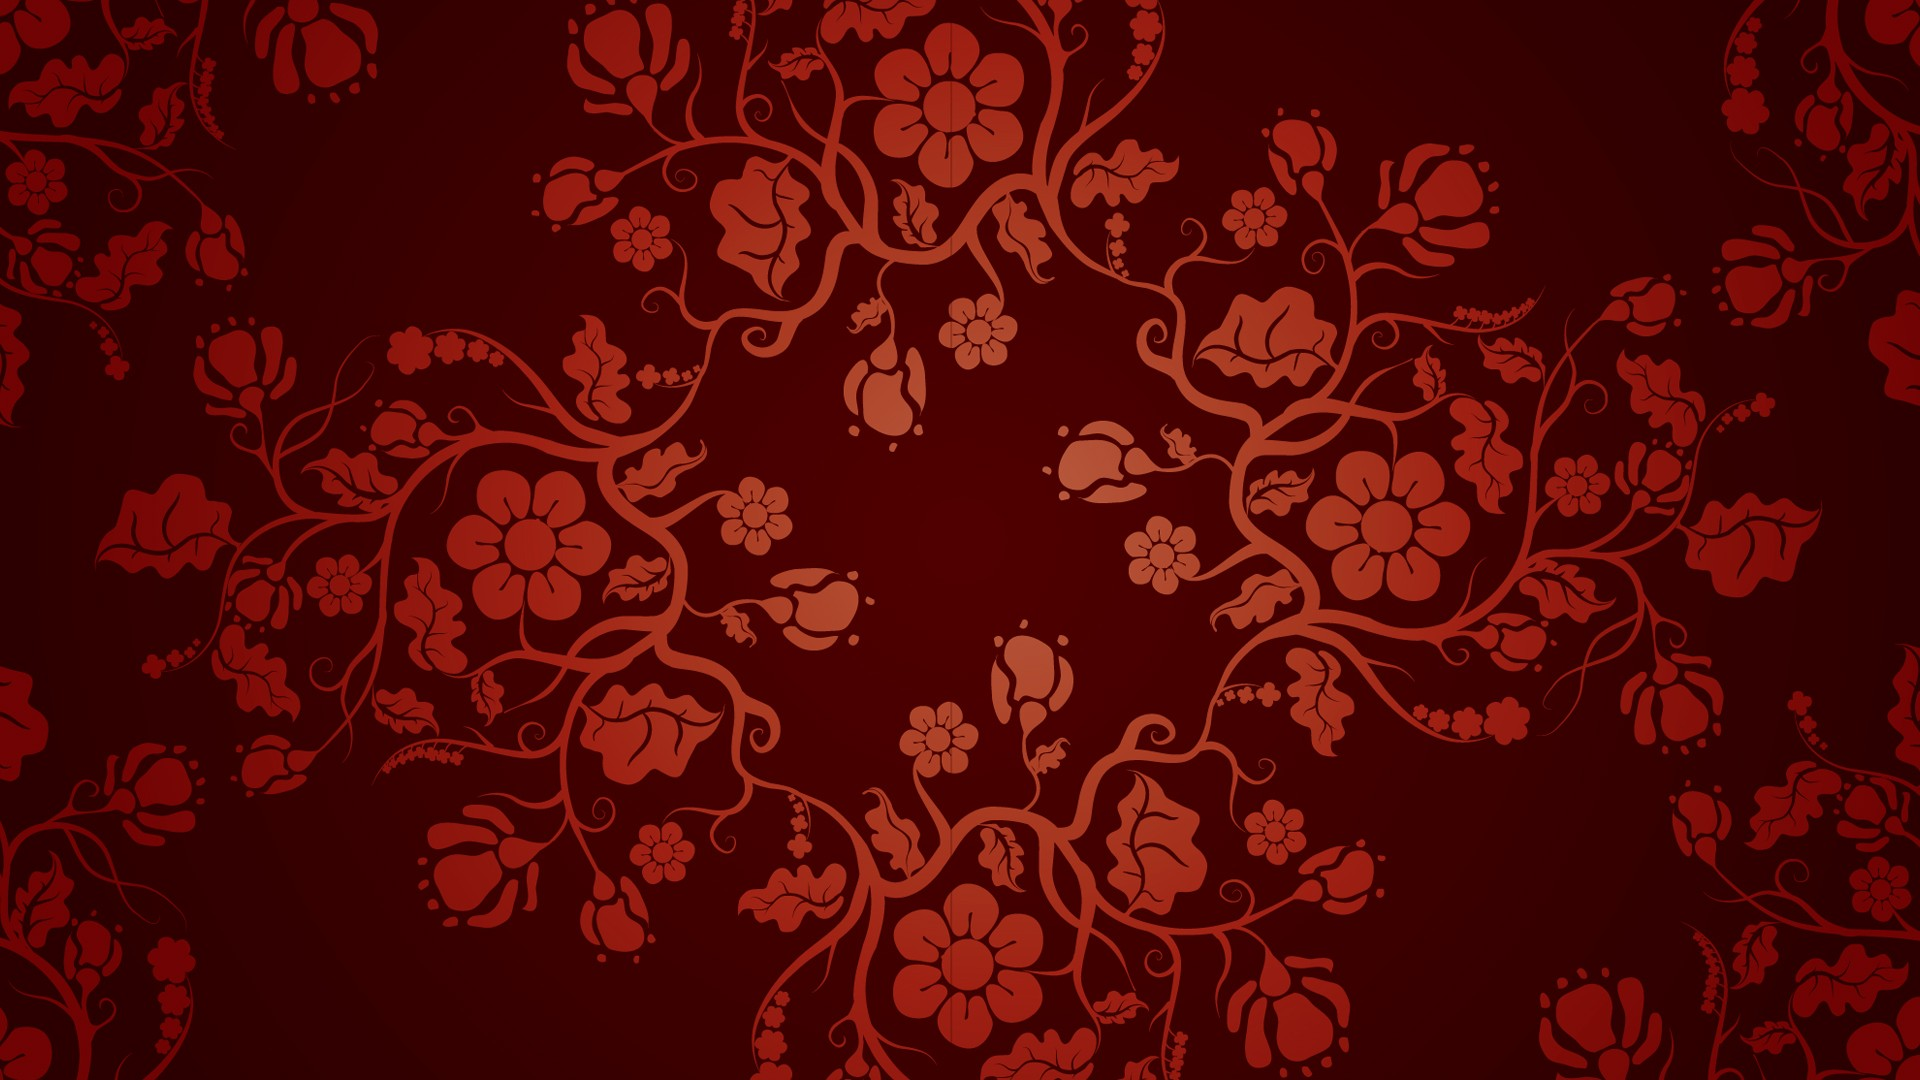 Chinese Dragon HD Desktop Wallpaper for K Ultra HD TV Wide